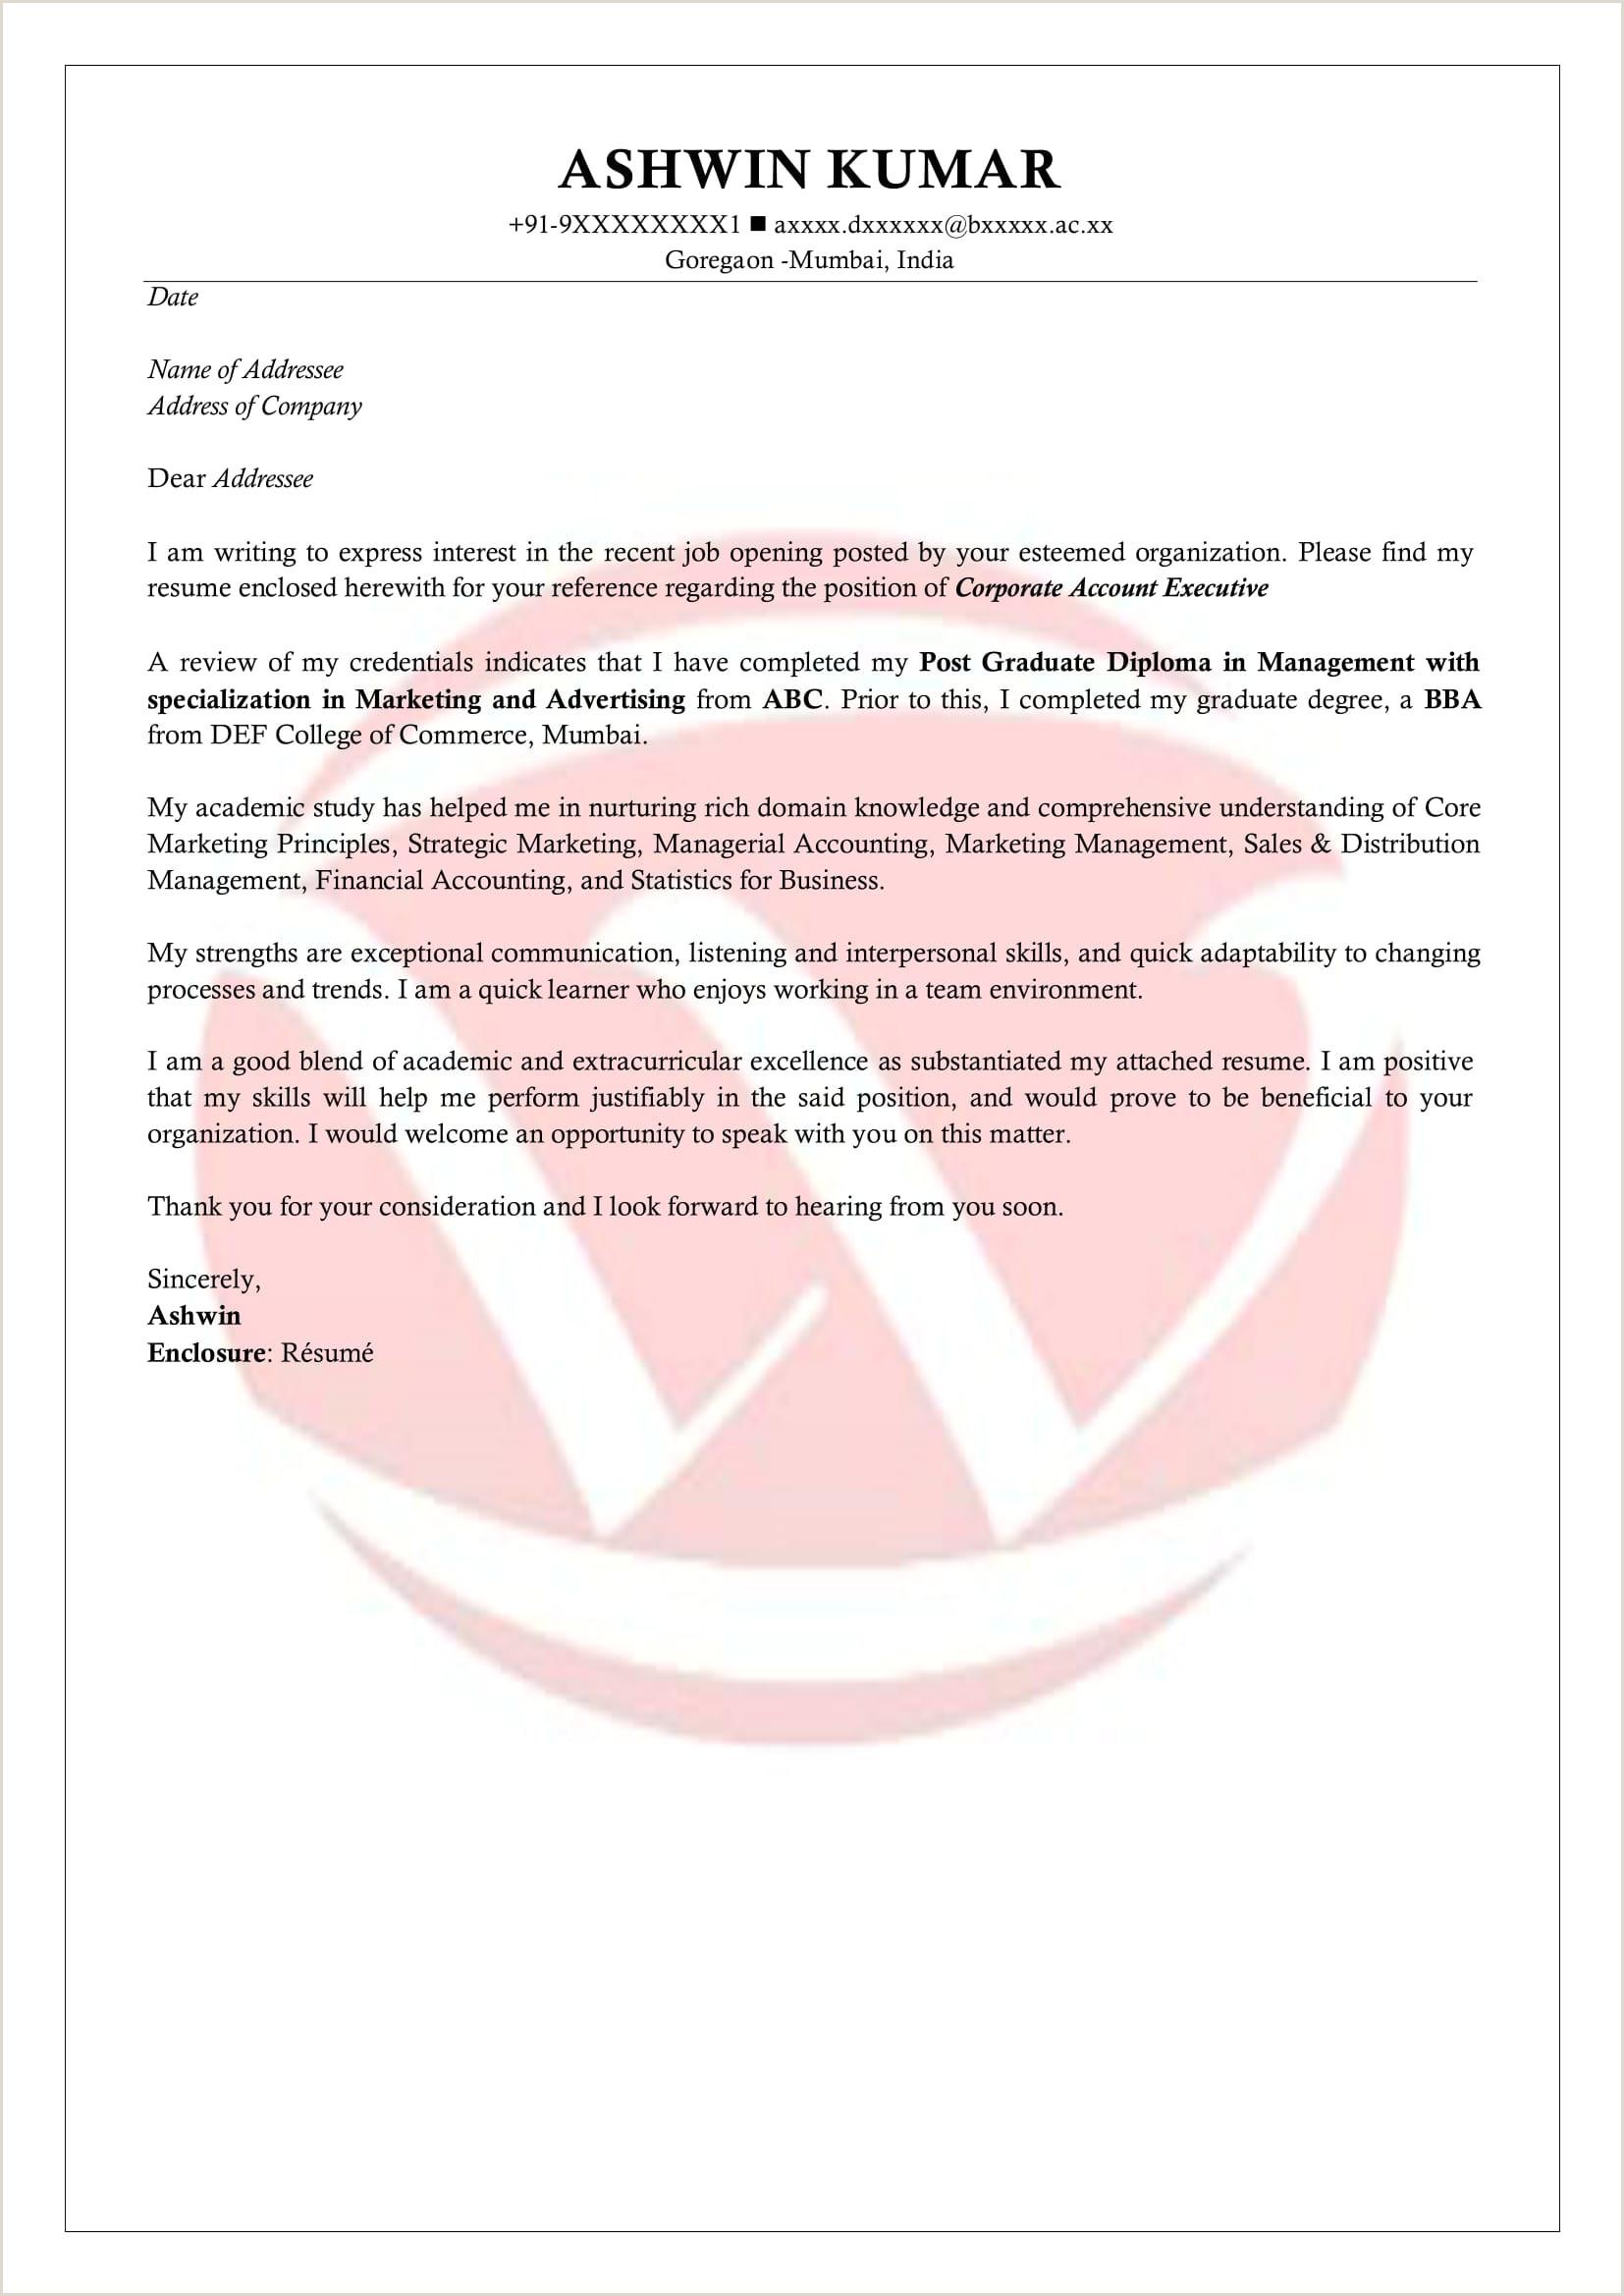 Fresher Resume Format For Job Interview Freshers Sample Cover Letter Format Download Cover Letter